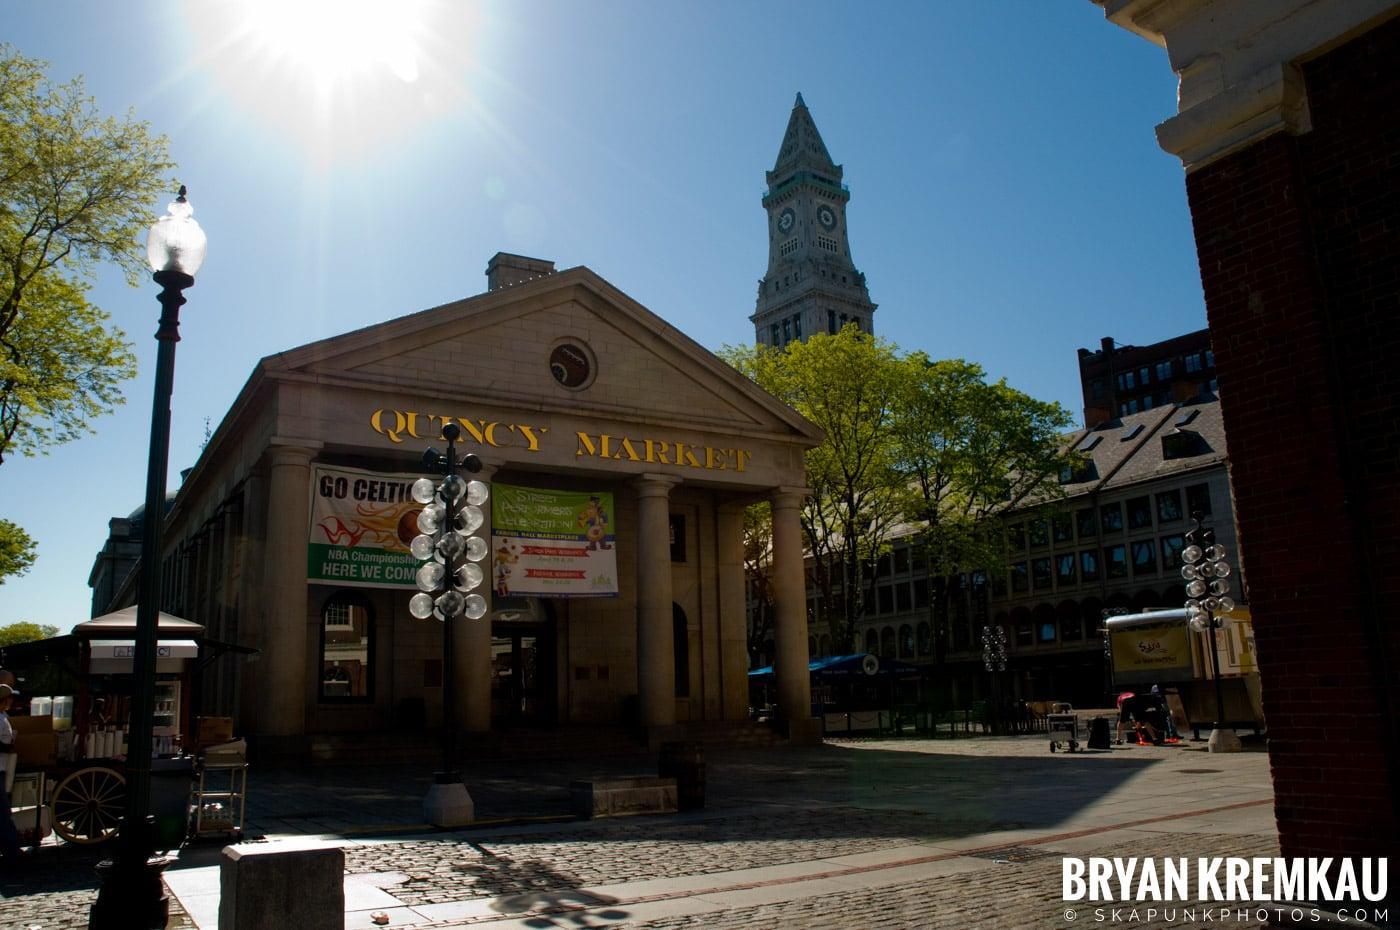 Memorial Day Weekend Trip to Boston - 5.25.08 (43)